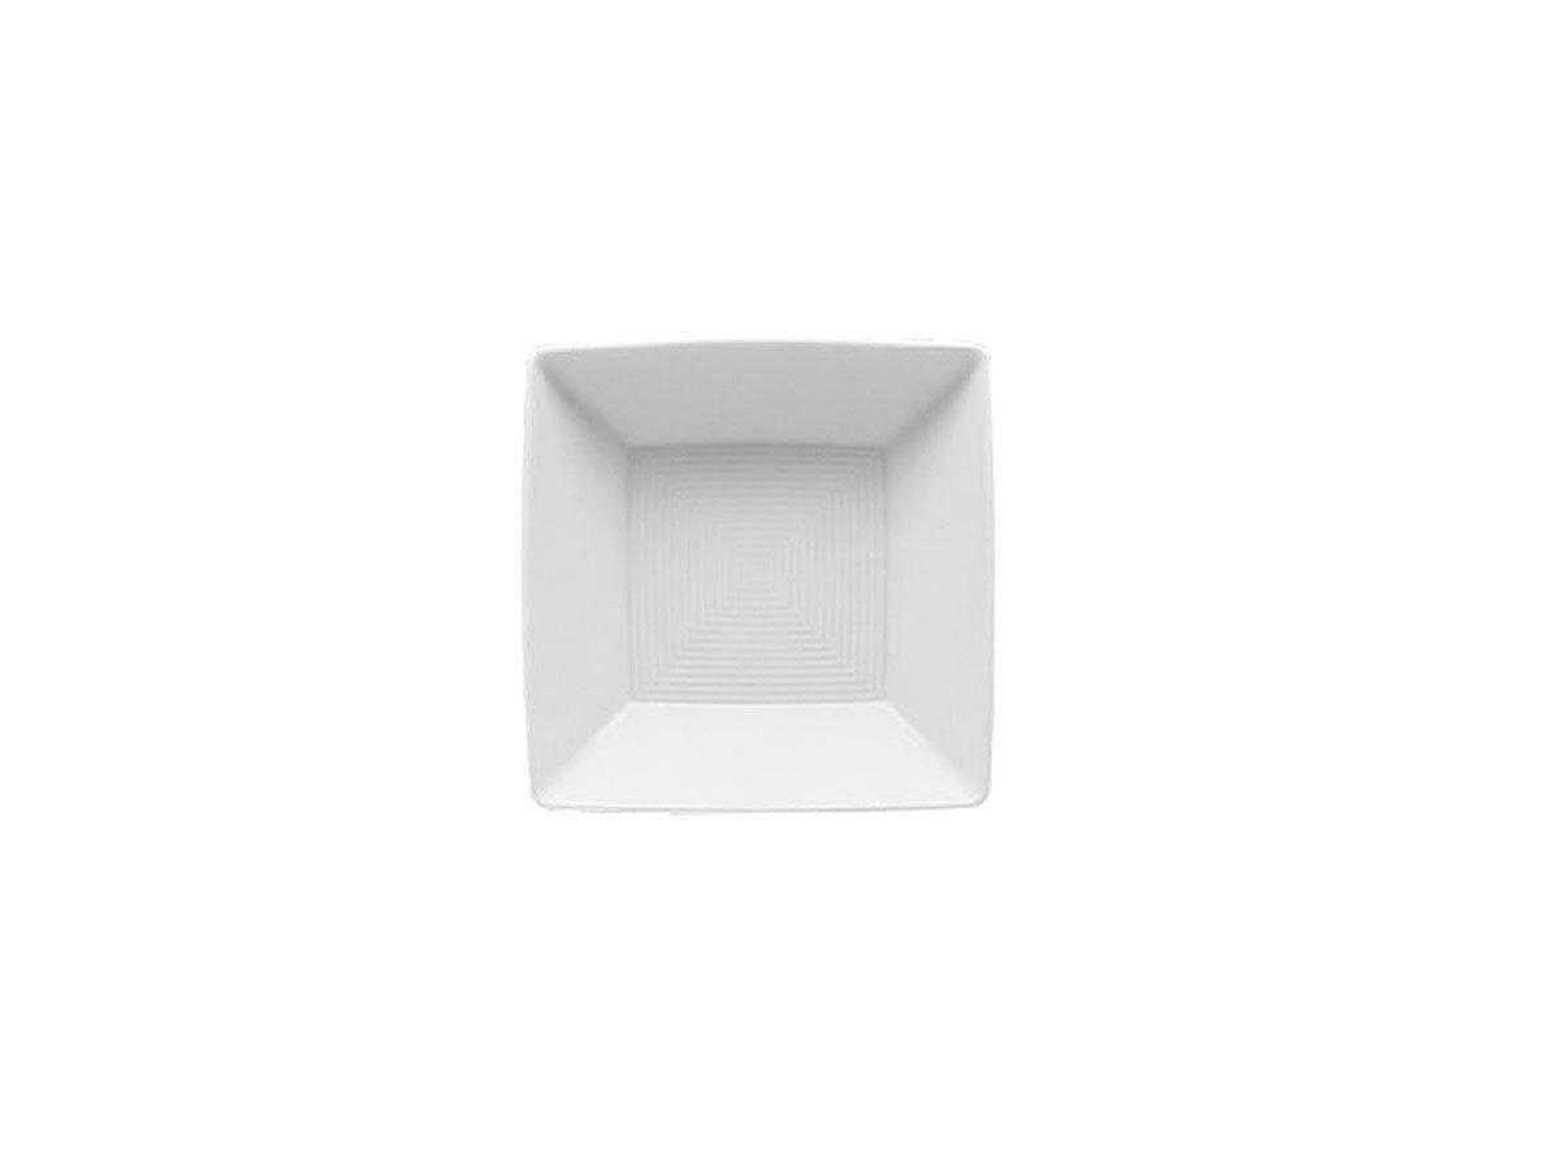 Онлайн каталог PROMENU: Пиала фарфоровая Rosenthal LOFT, 21х21 см, белый Rosenthal 11900-800001-13071